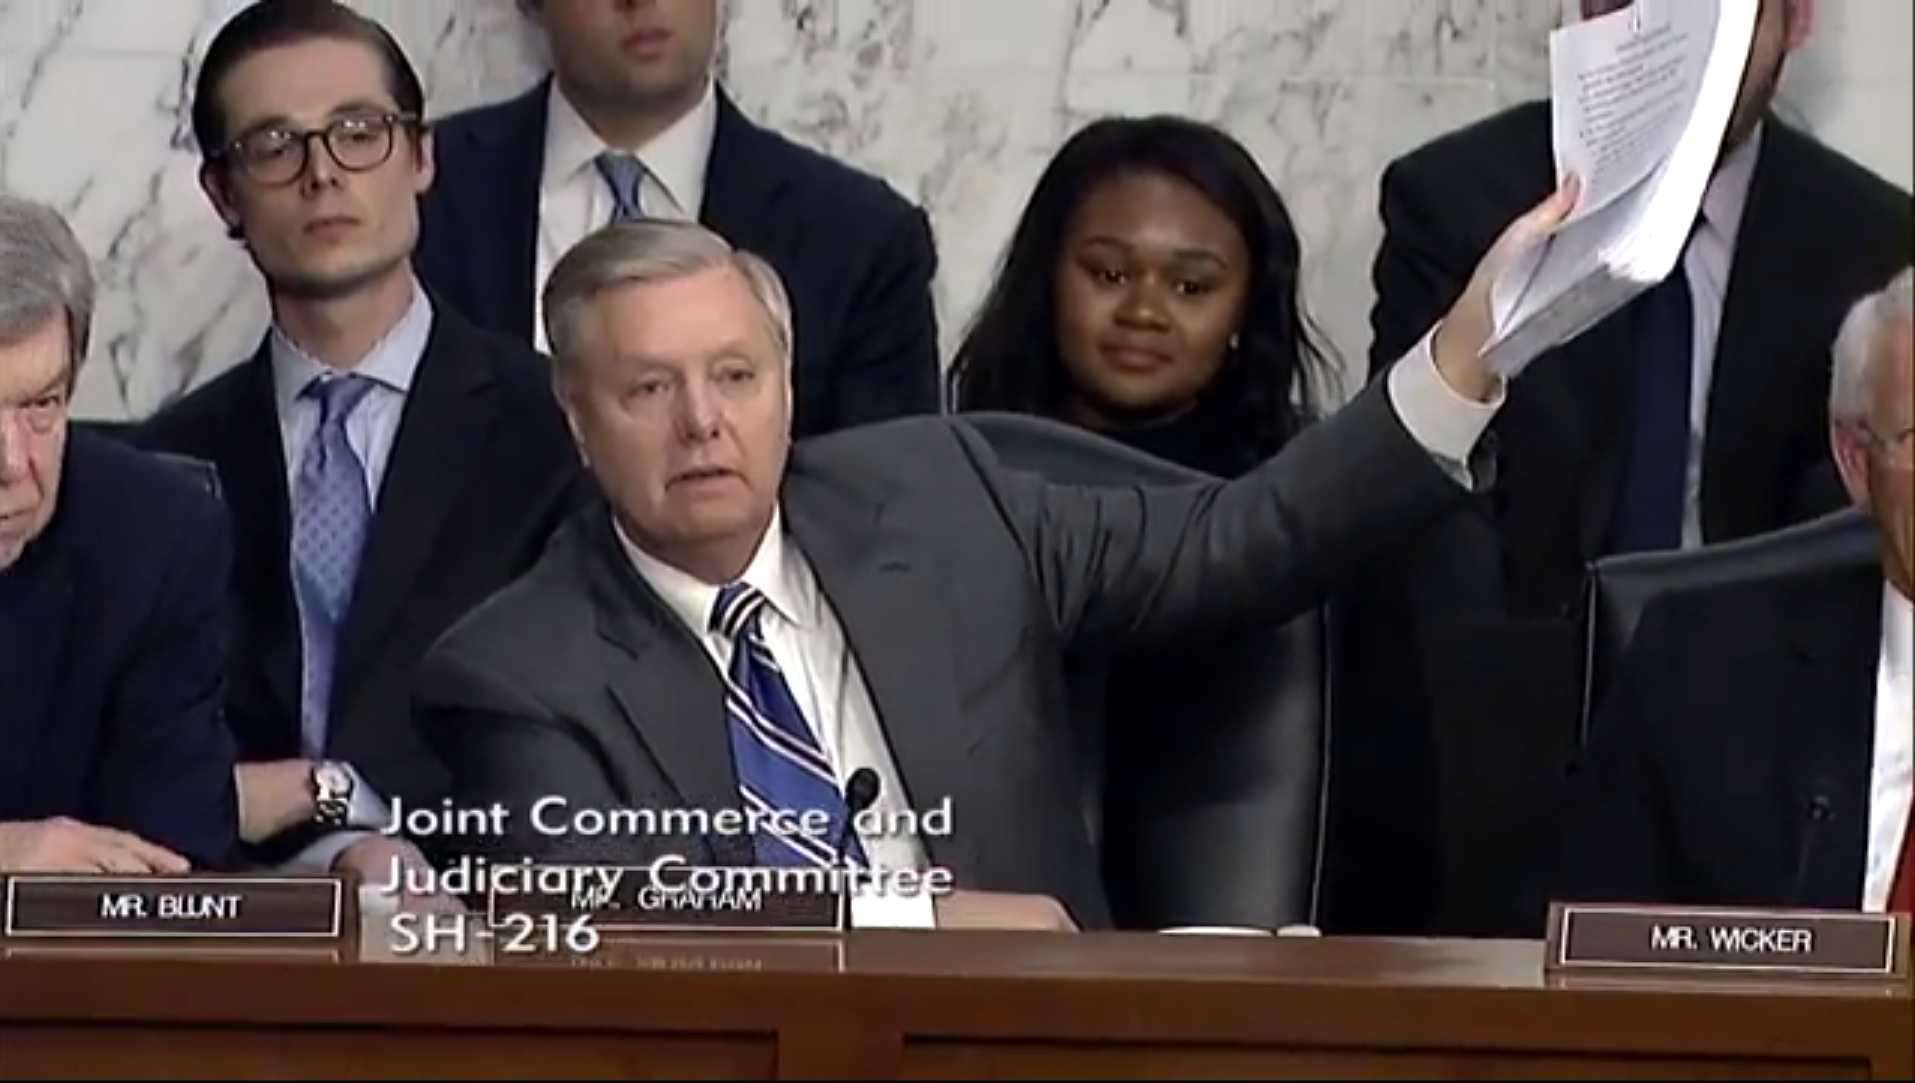 Senator Graham hält einen dicken Stapel Papier hoch